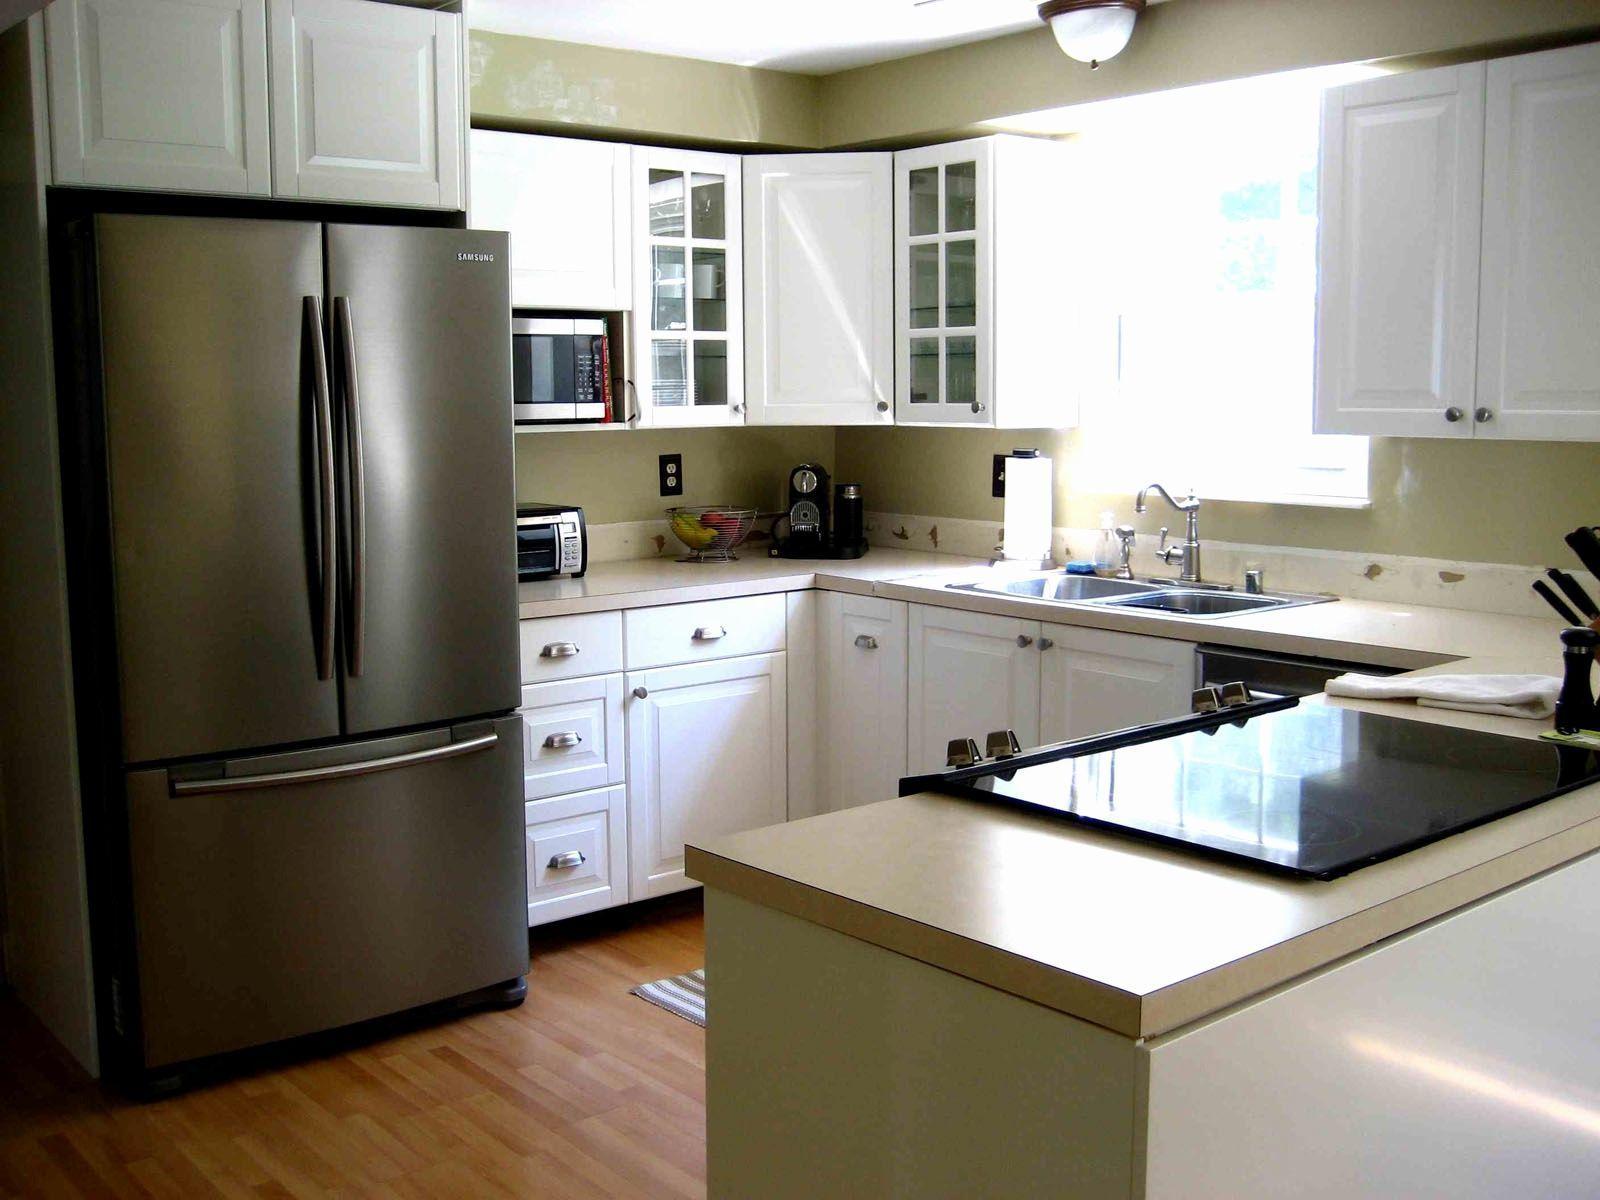 More Ideas Below #Kitchenremodel #Kitchenideas Small U Shaped Kitchen With